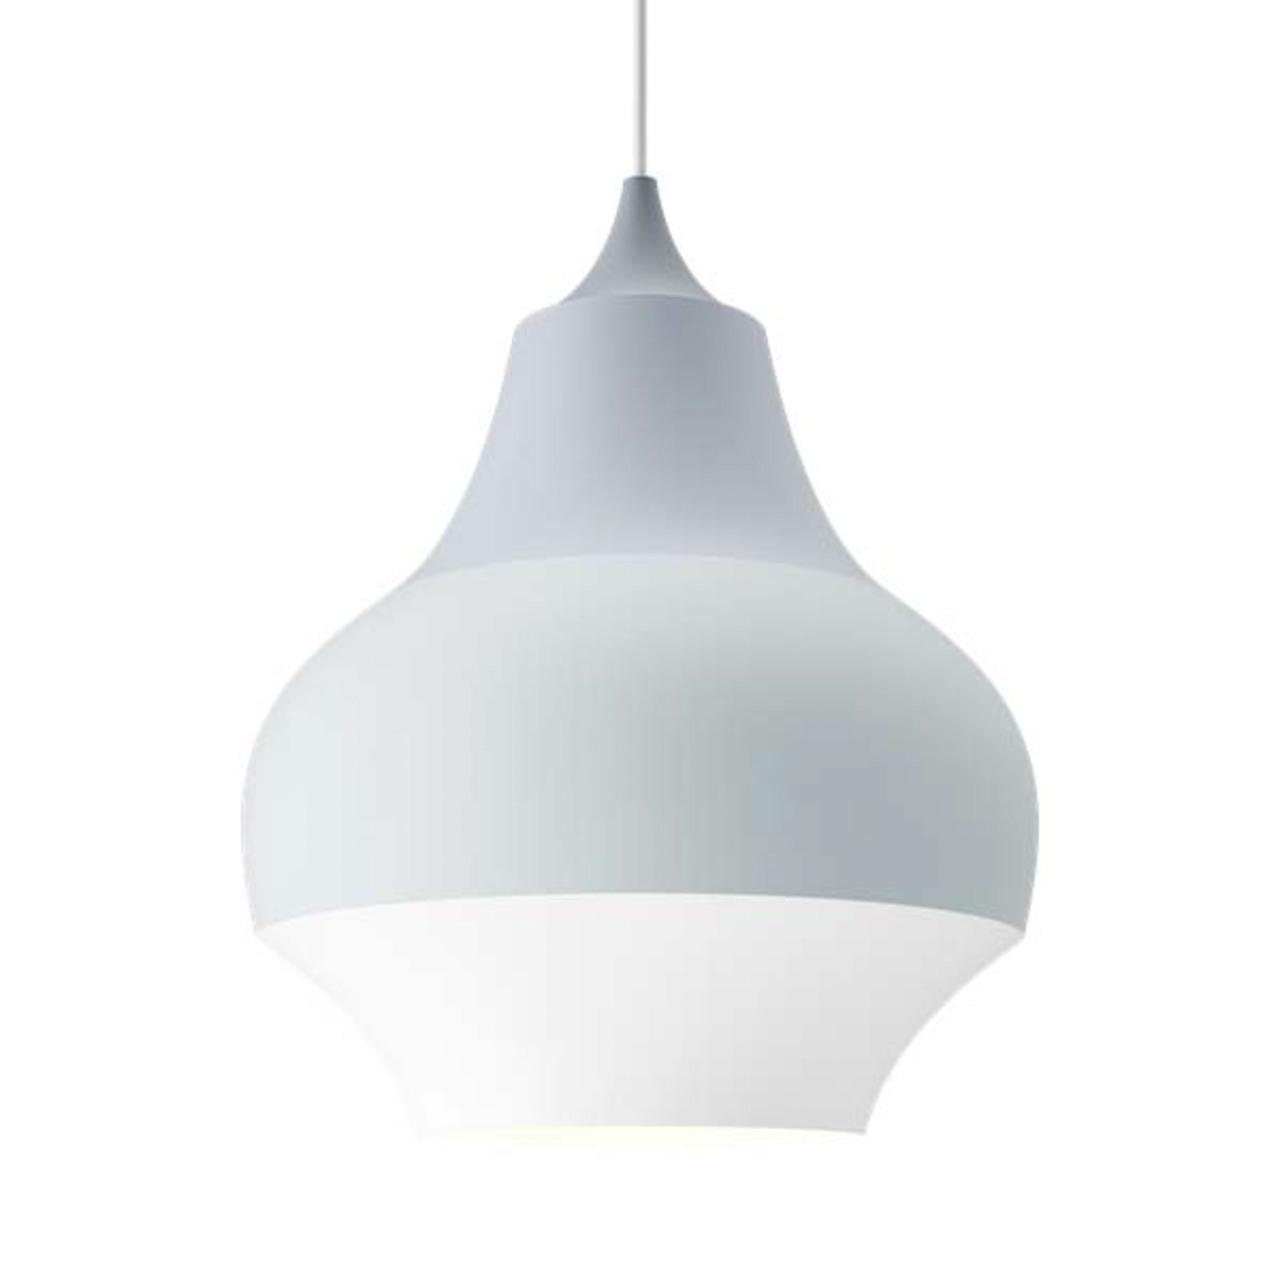 Louis Poulsen Lampe 'Cirque' Ø: 38 cm, Grau